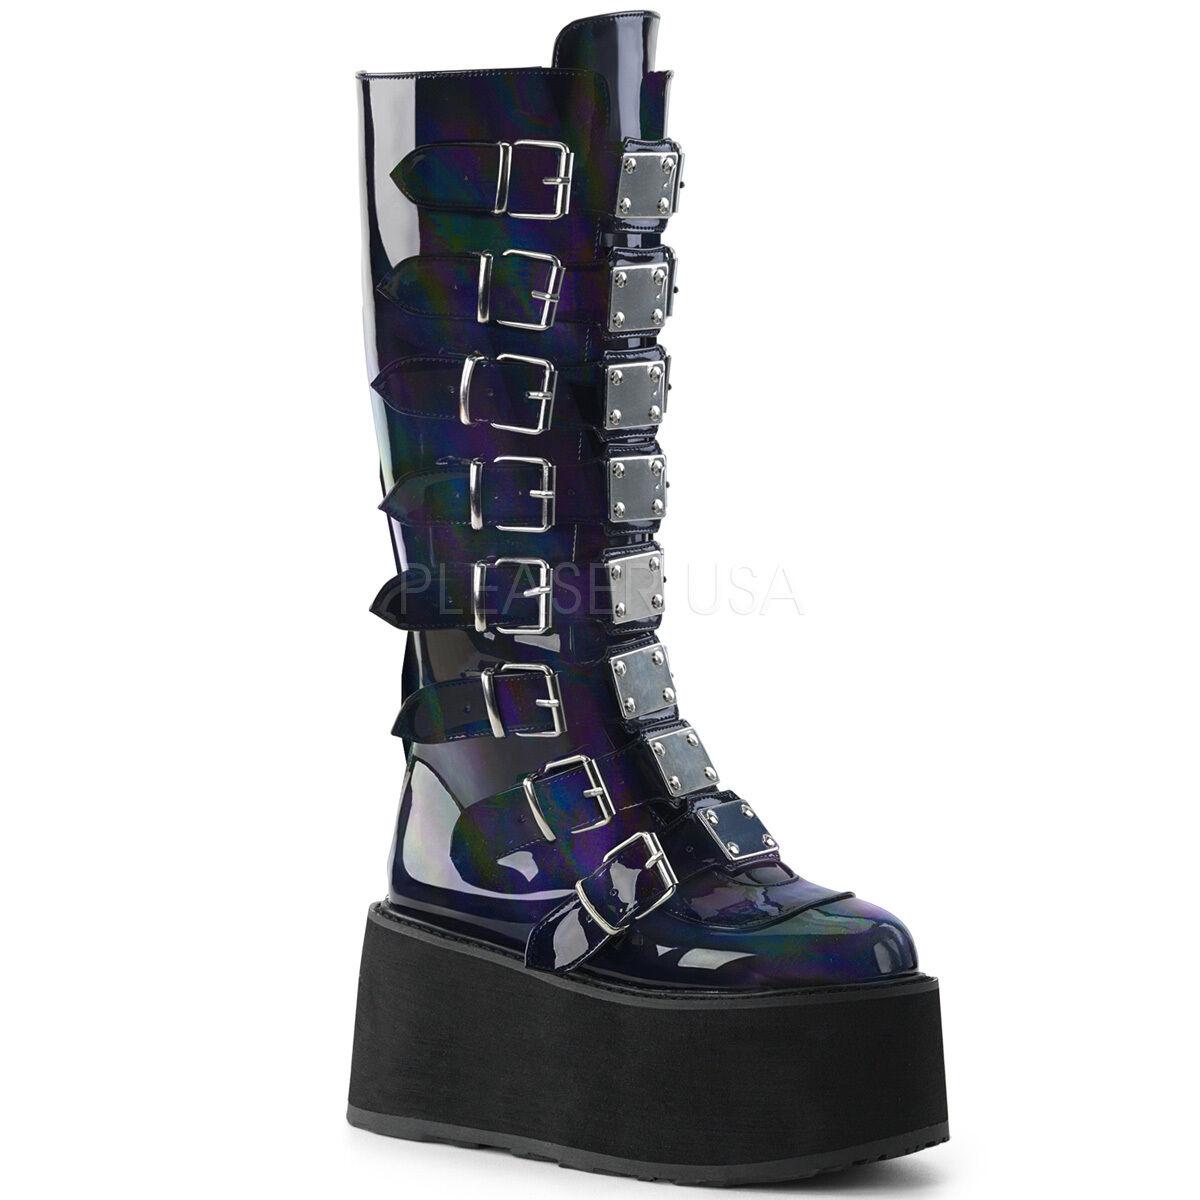 Demonia Blk Hologram 3.5  Platform Buckle Metal Plate Knee Boots Club Goth 6-12